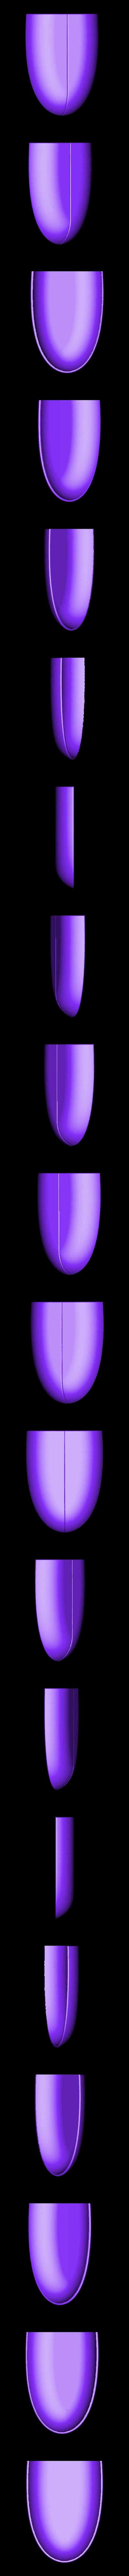 Bug-Box-Wings.stl Download free STL file Bug-Box • 3D printable design, Leander-Flossie